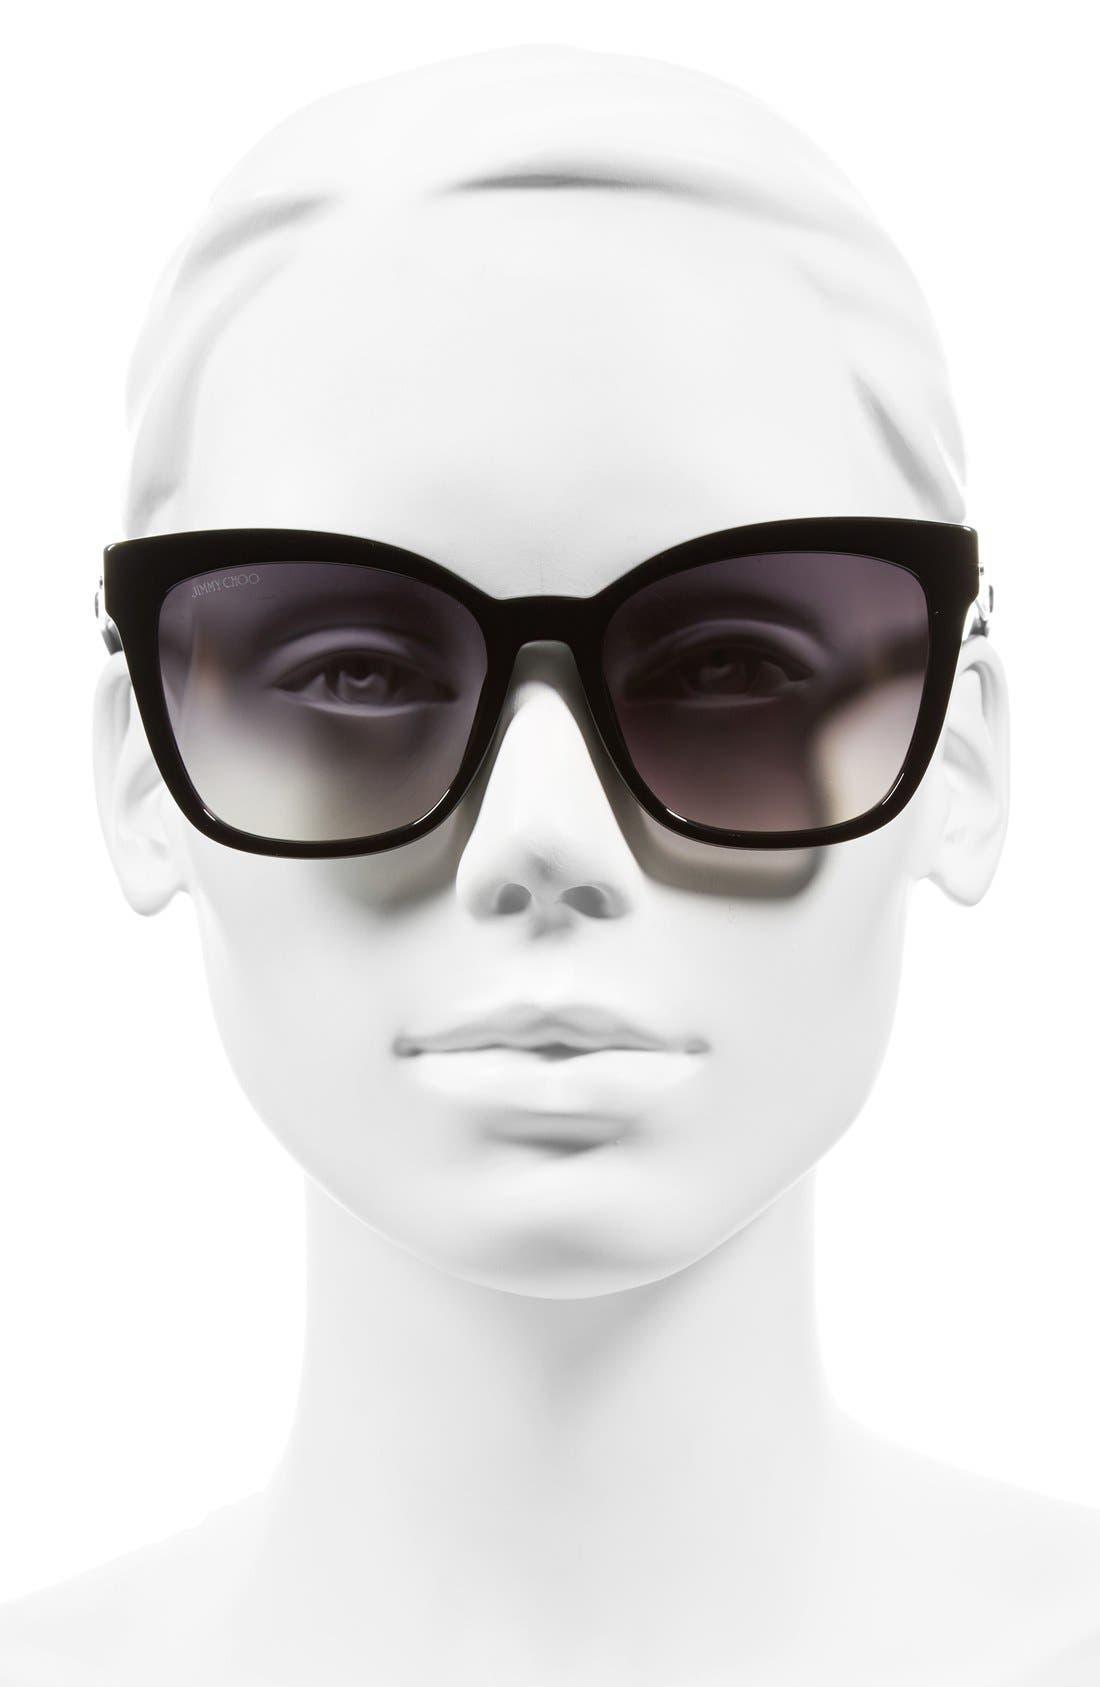 55mm Retro Sunglasses,                             Alternate thumbnail 2, color,                             001